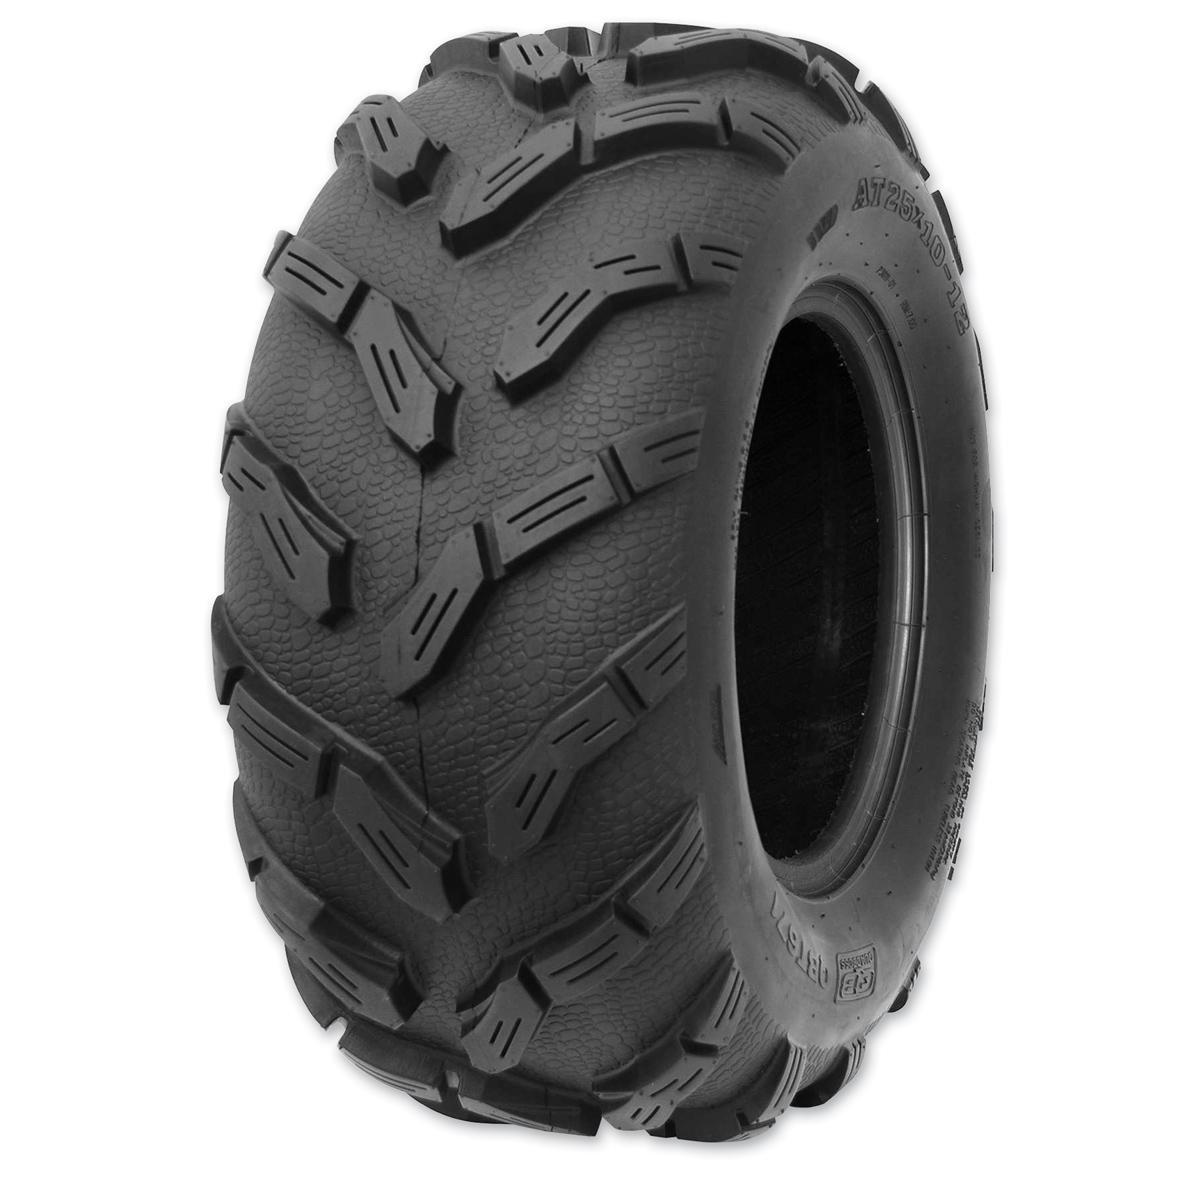 Quadboss QBT671 27X12-12 6-Ply Rear Tire